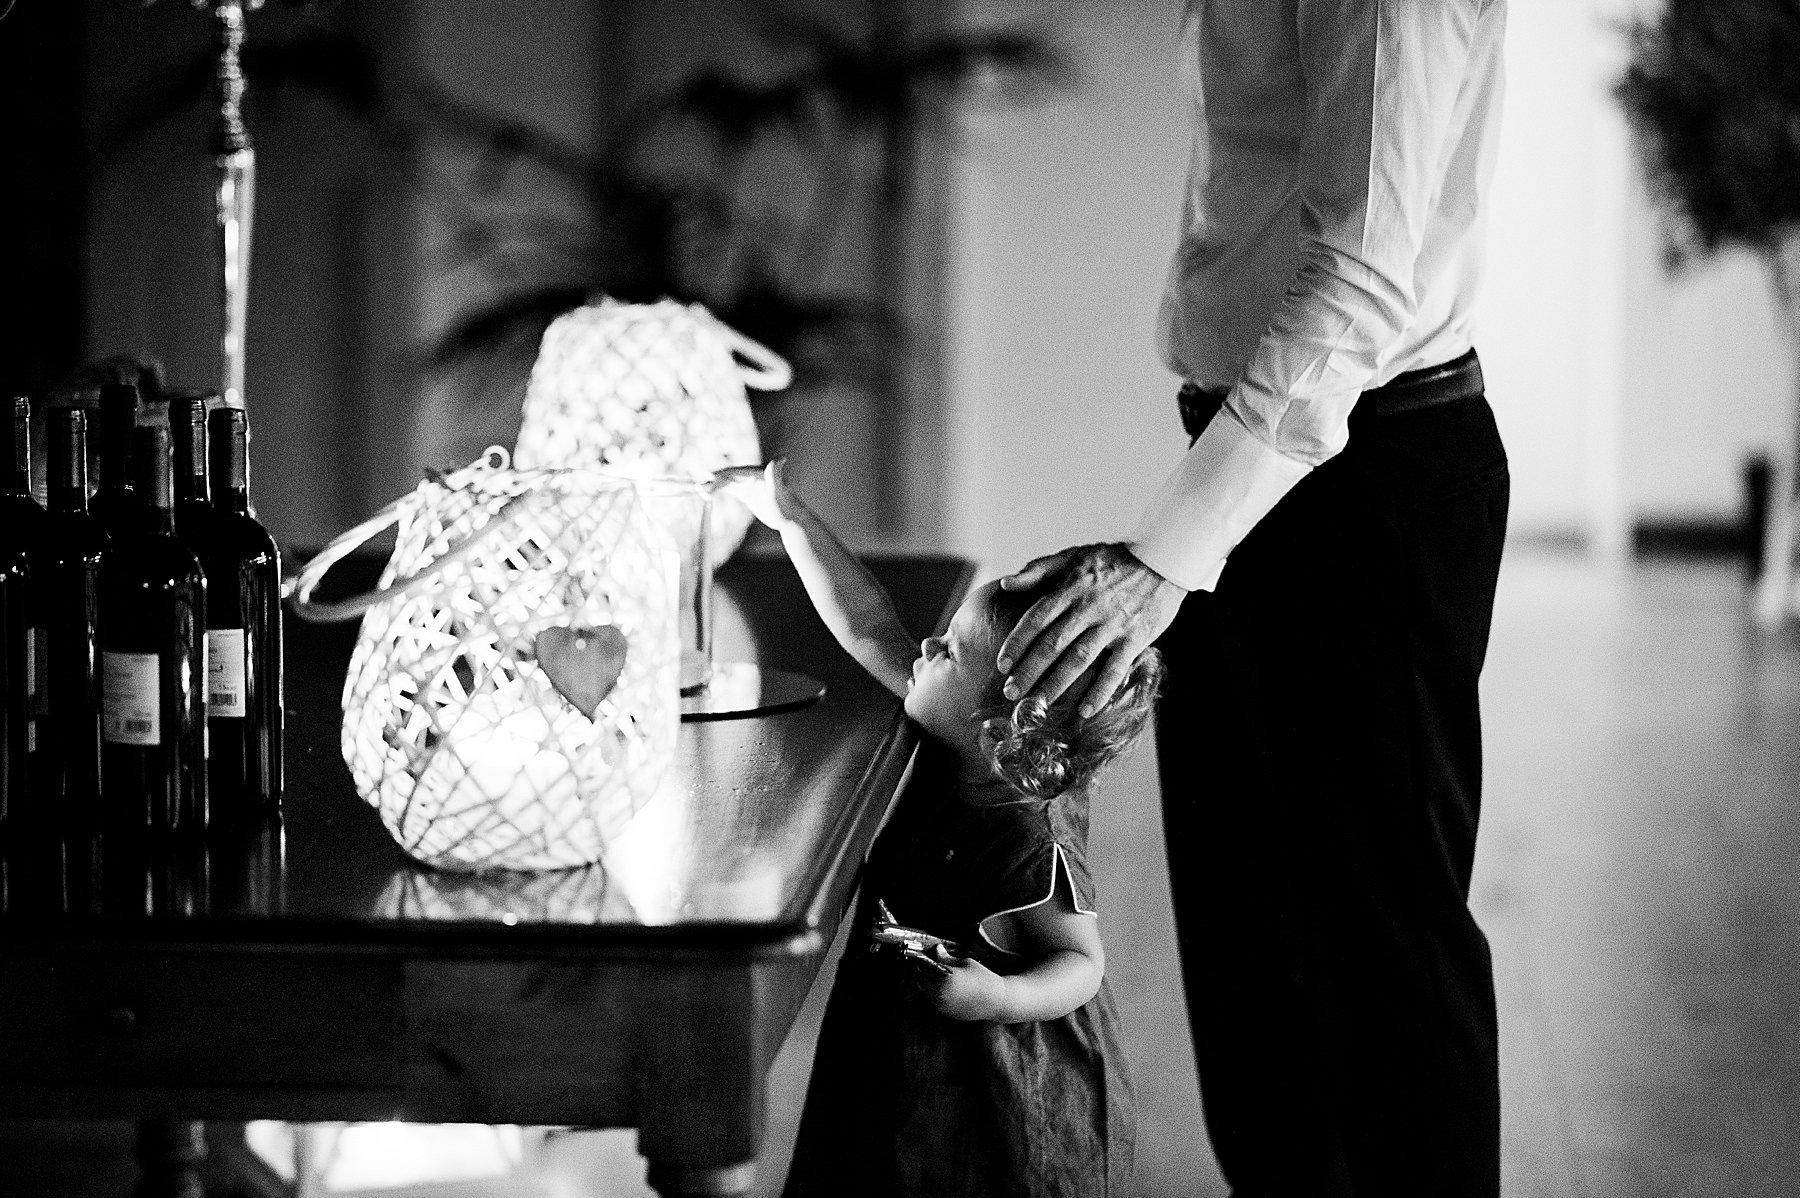 ricevimento cena matrimonio agriturismo relais campiglioni montevarchi